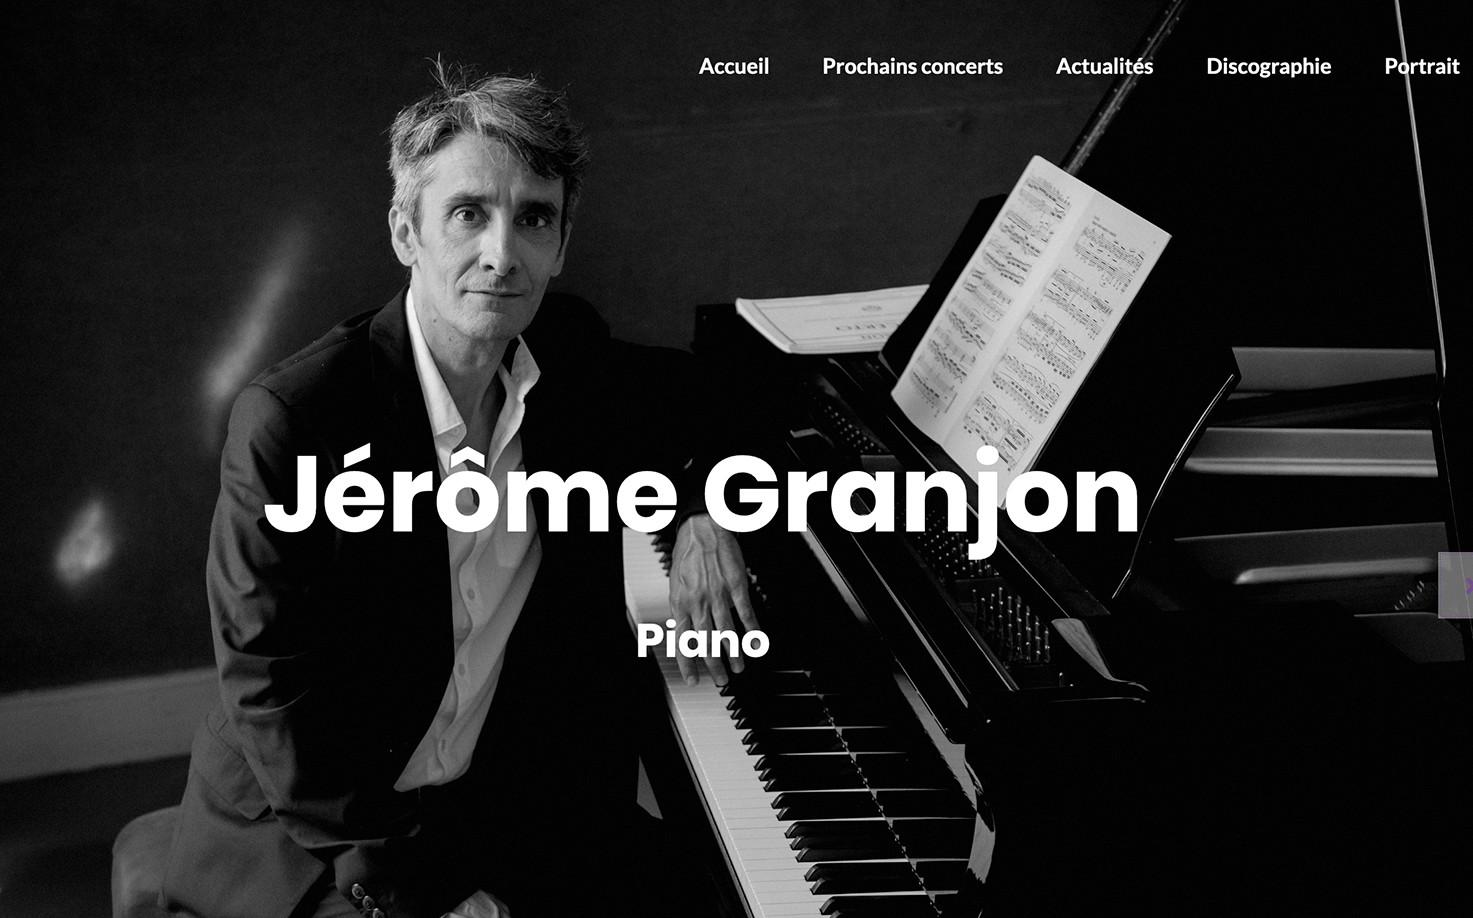 Jérome_Granjon_portrait.jpg